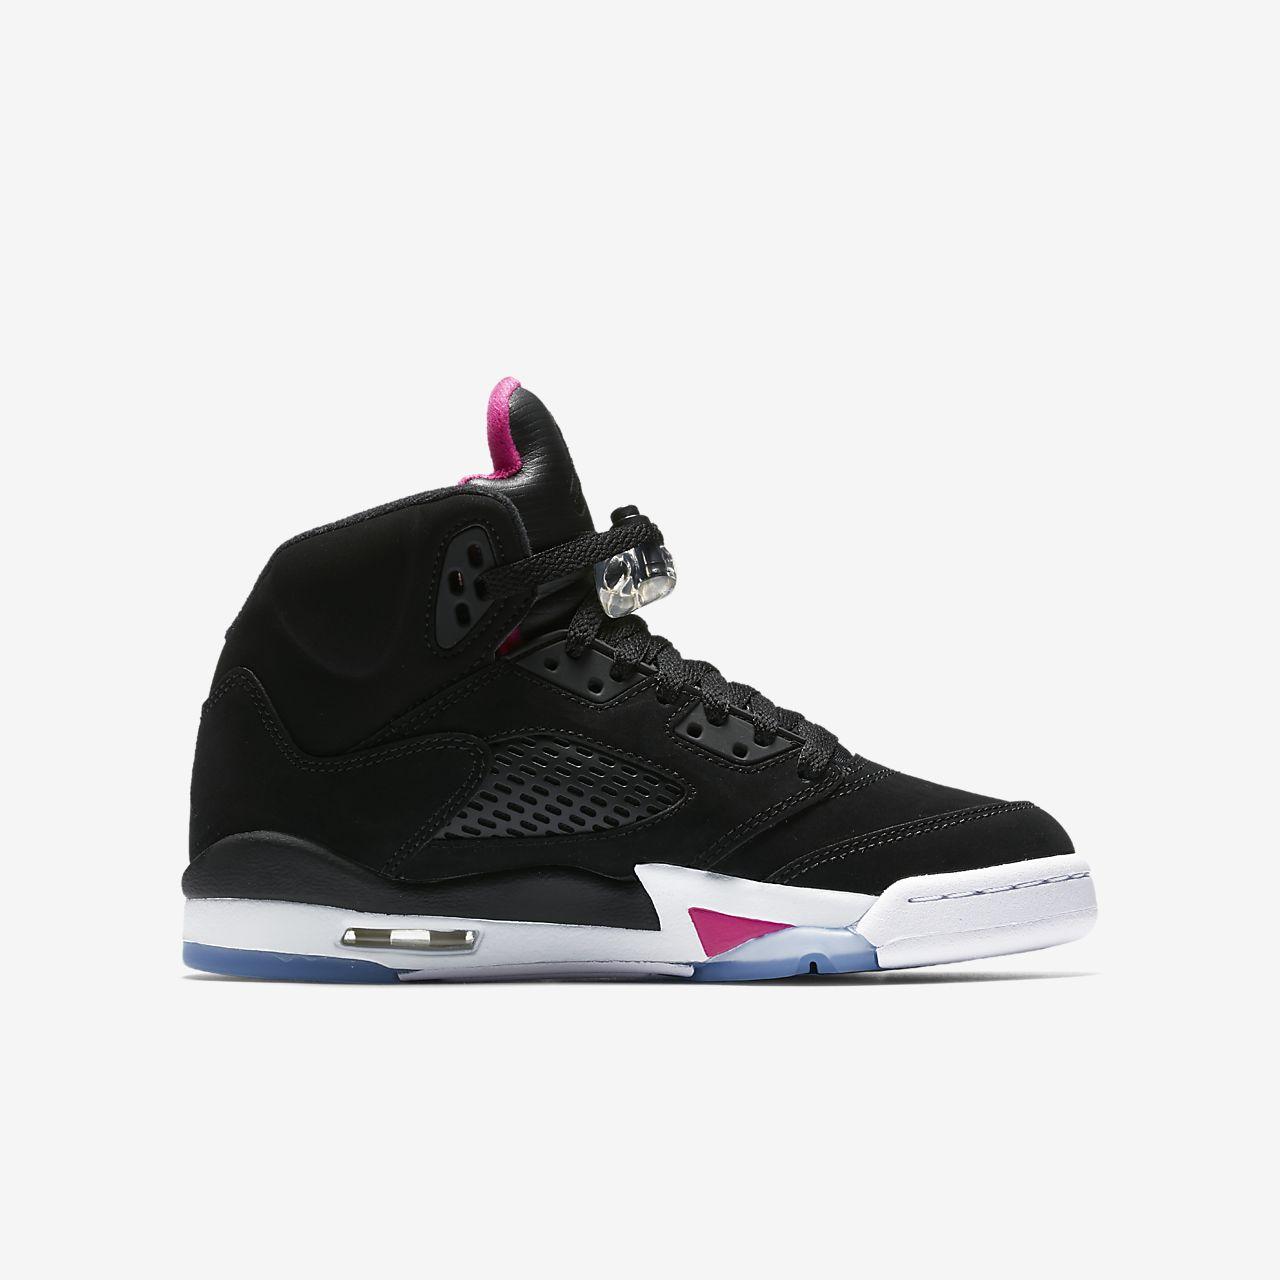 hot sale online 6817e 56b56 Air Jordan 5 Retro Older Kids' Shoe